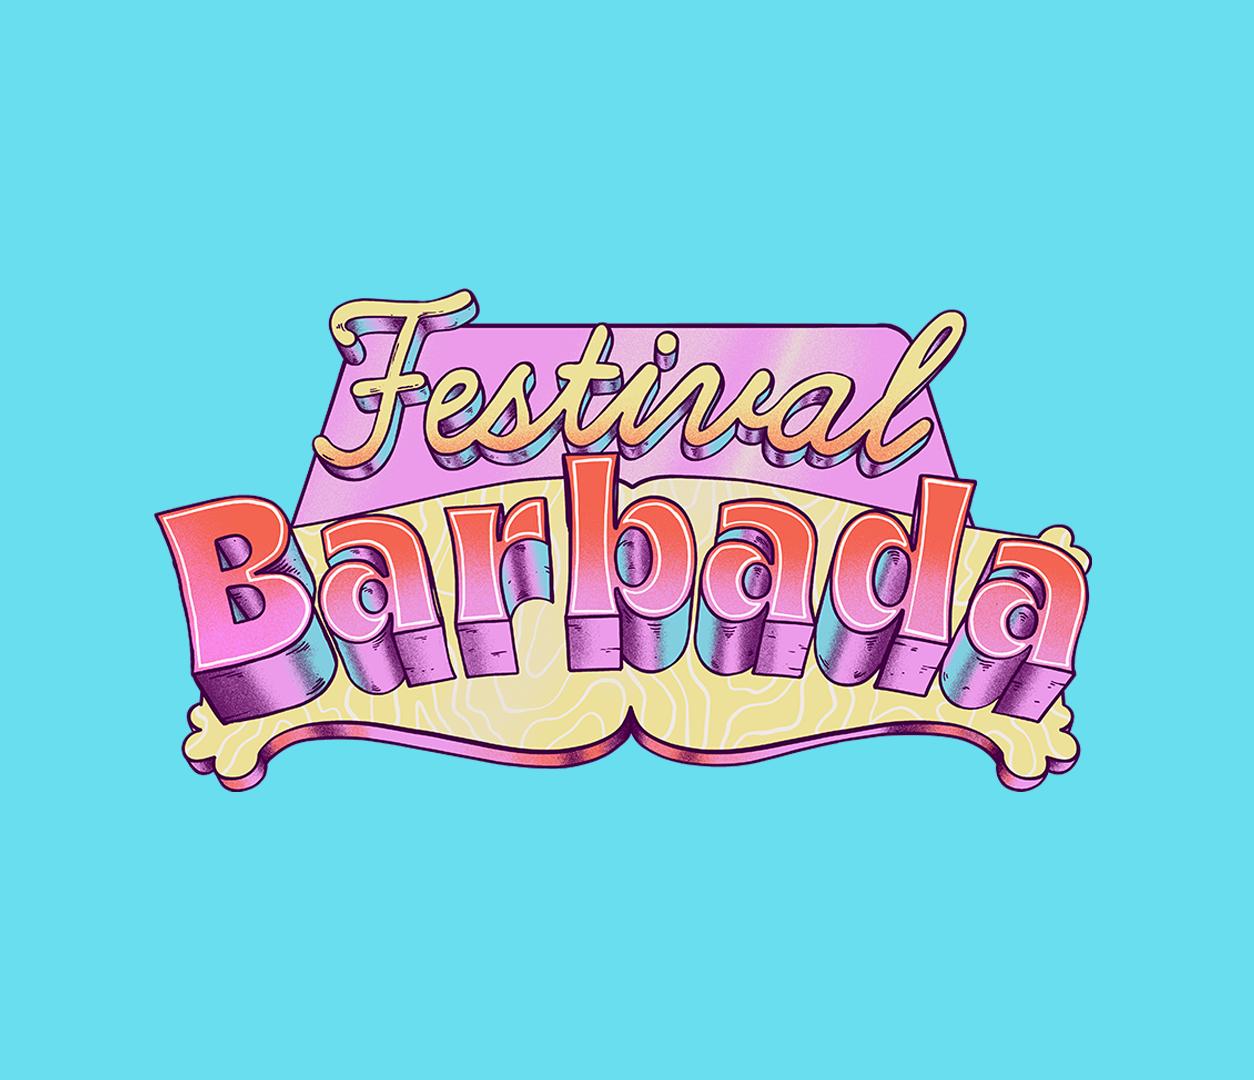 Festival Barbada - 10 anos